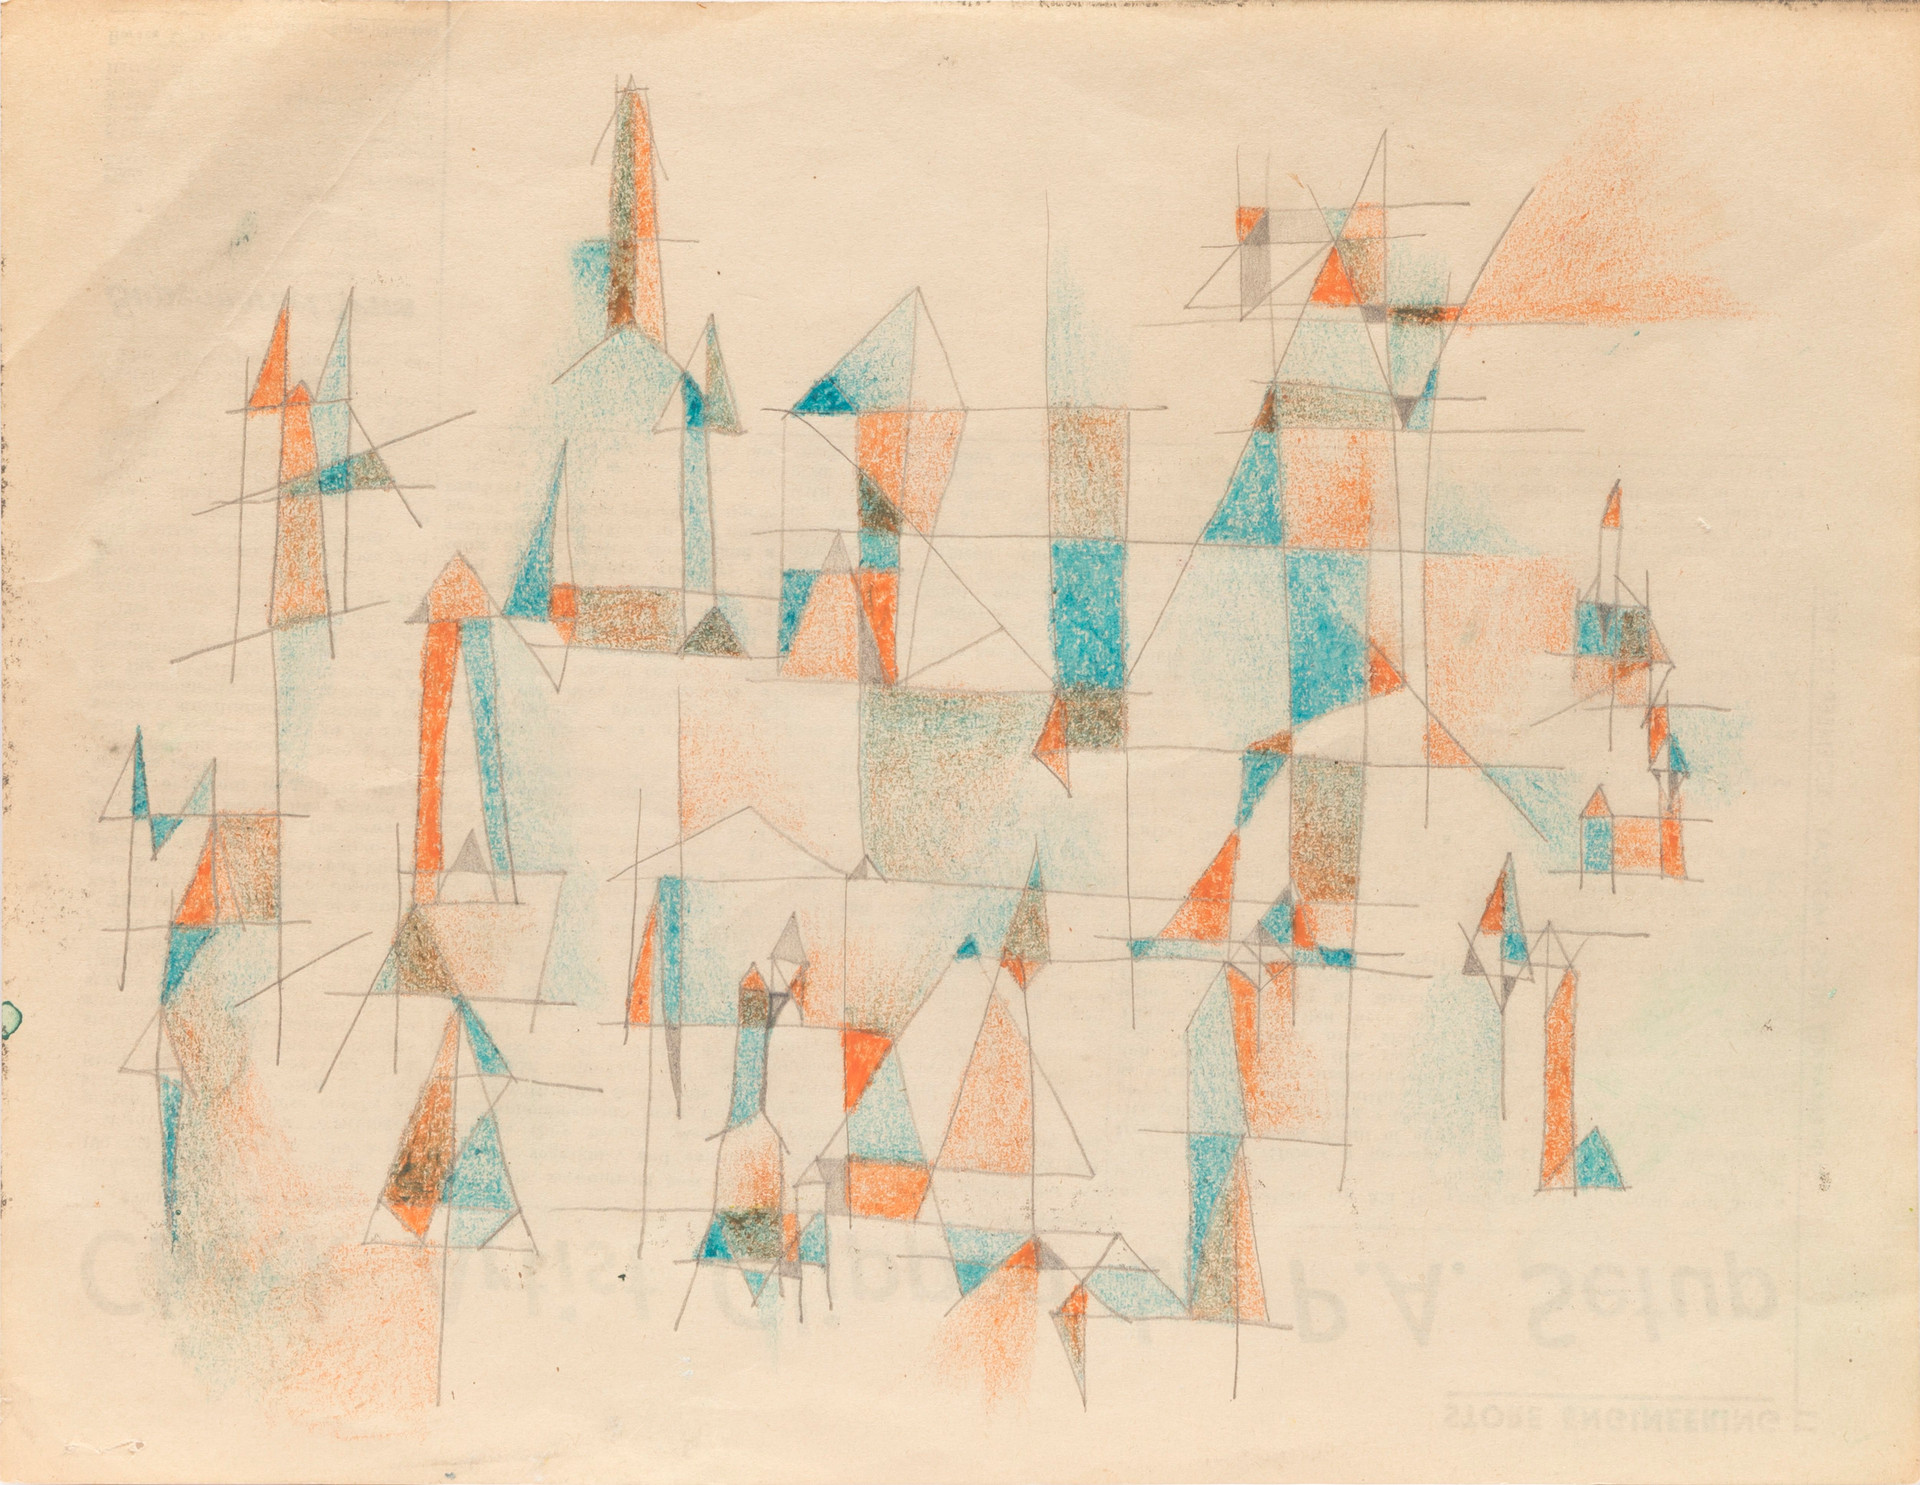 Untitled sketch - orange and blue blocks